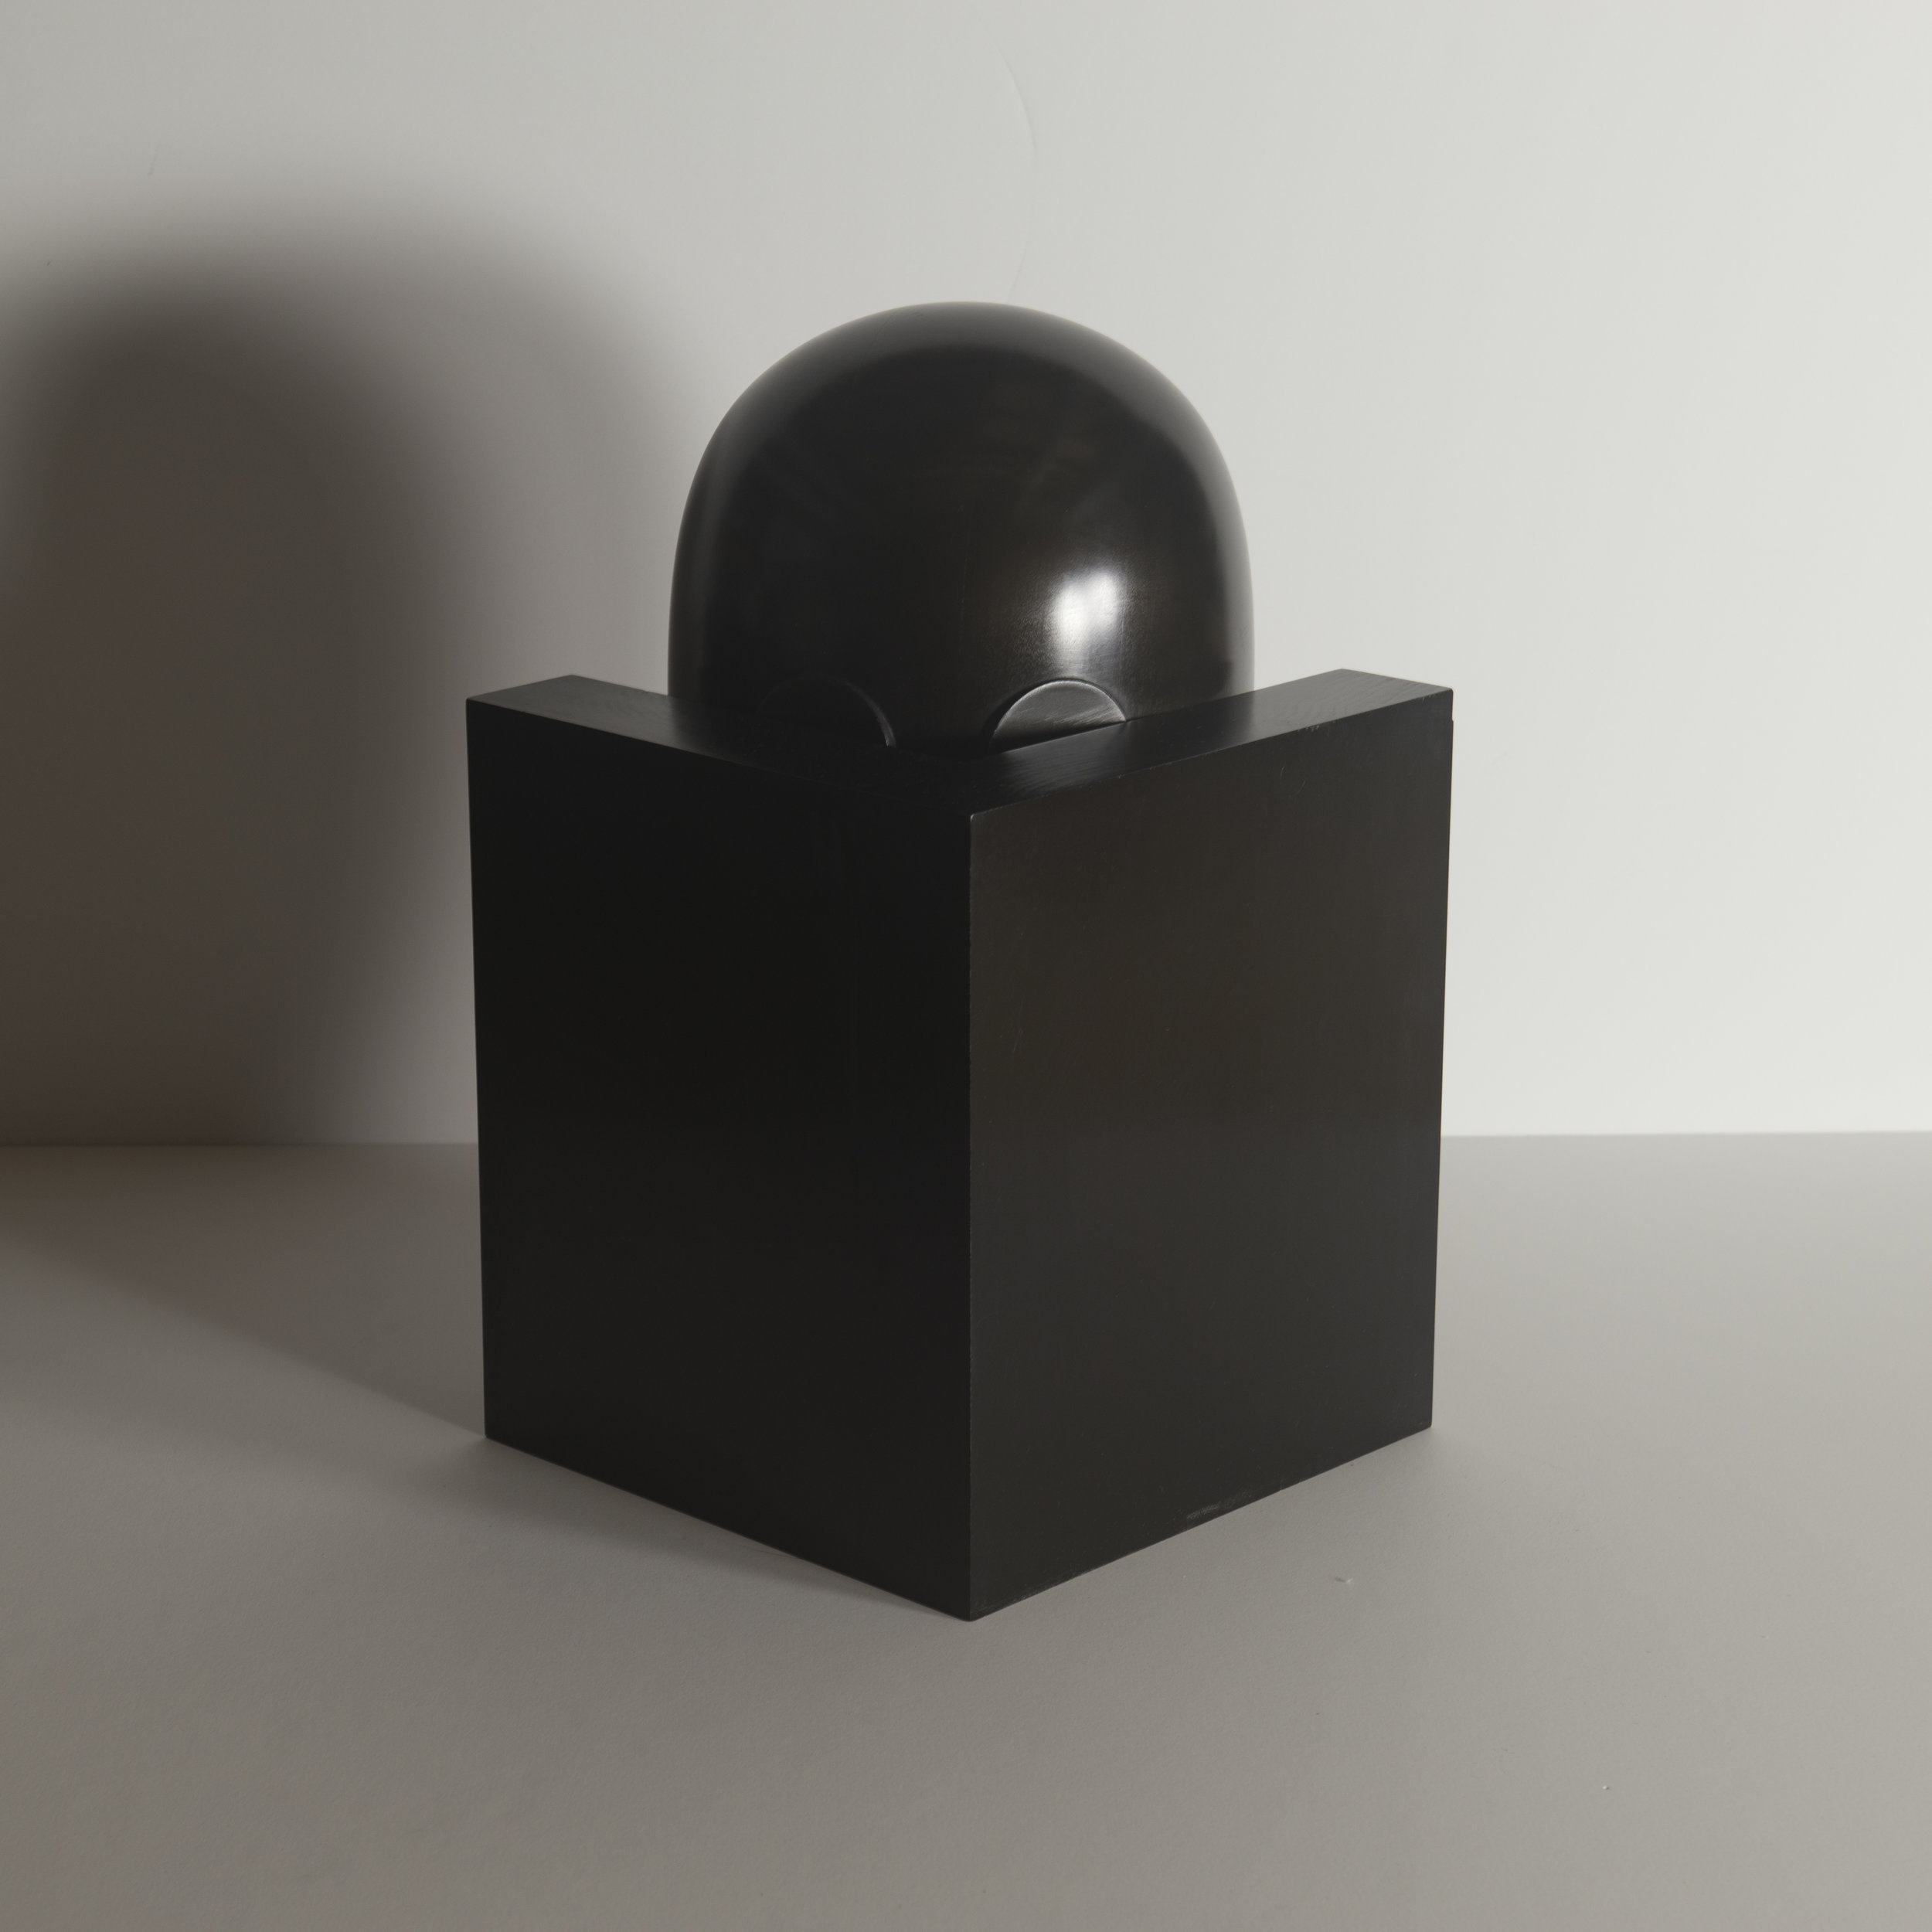 Monochrome Colletive : Gary Kret : Punnishment : maple, black aniline dye paste, wax finish : 15.5 x 9.5 x 9.5 in. : $3,200.jpg